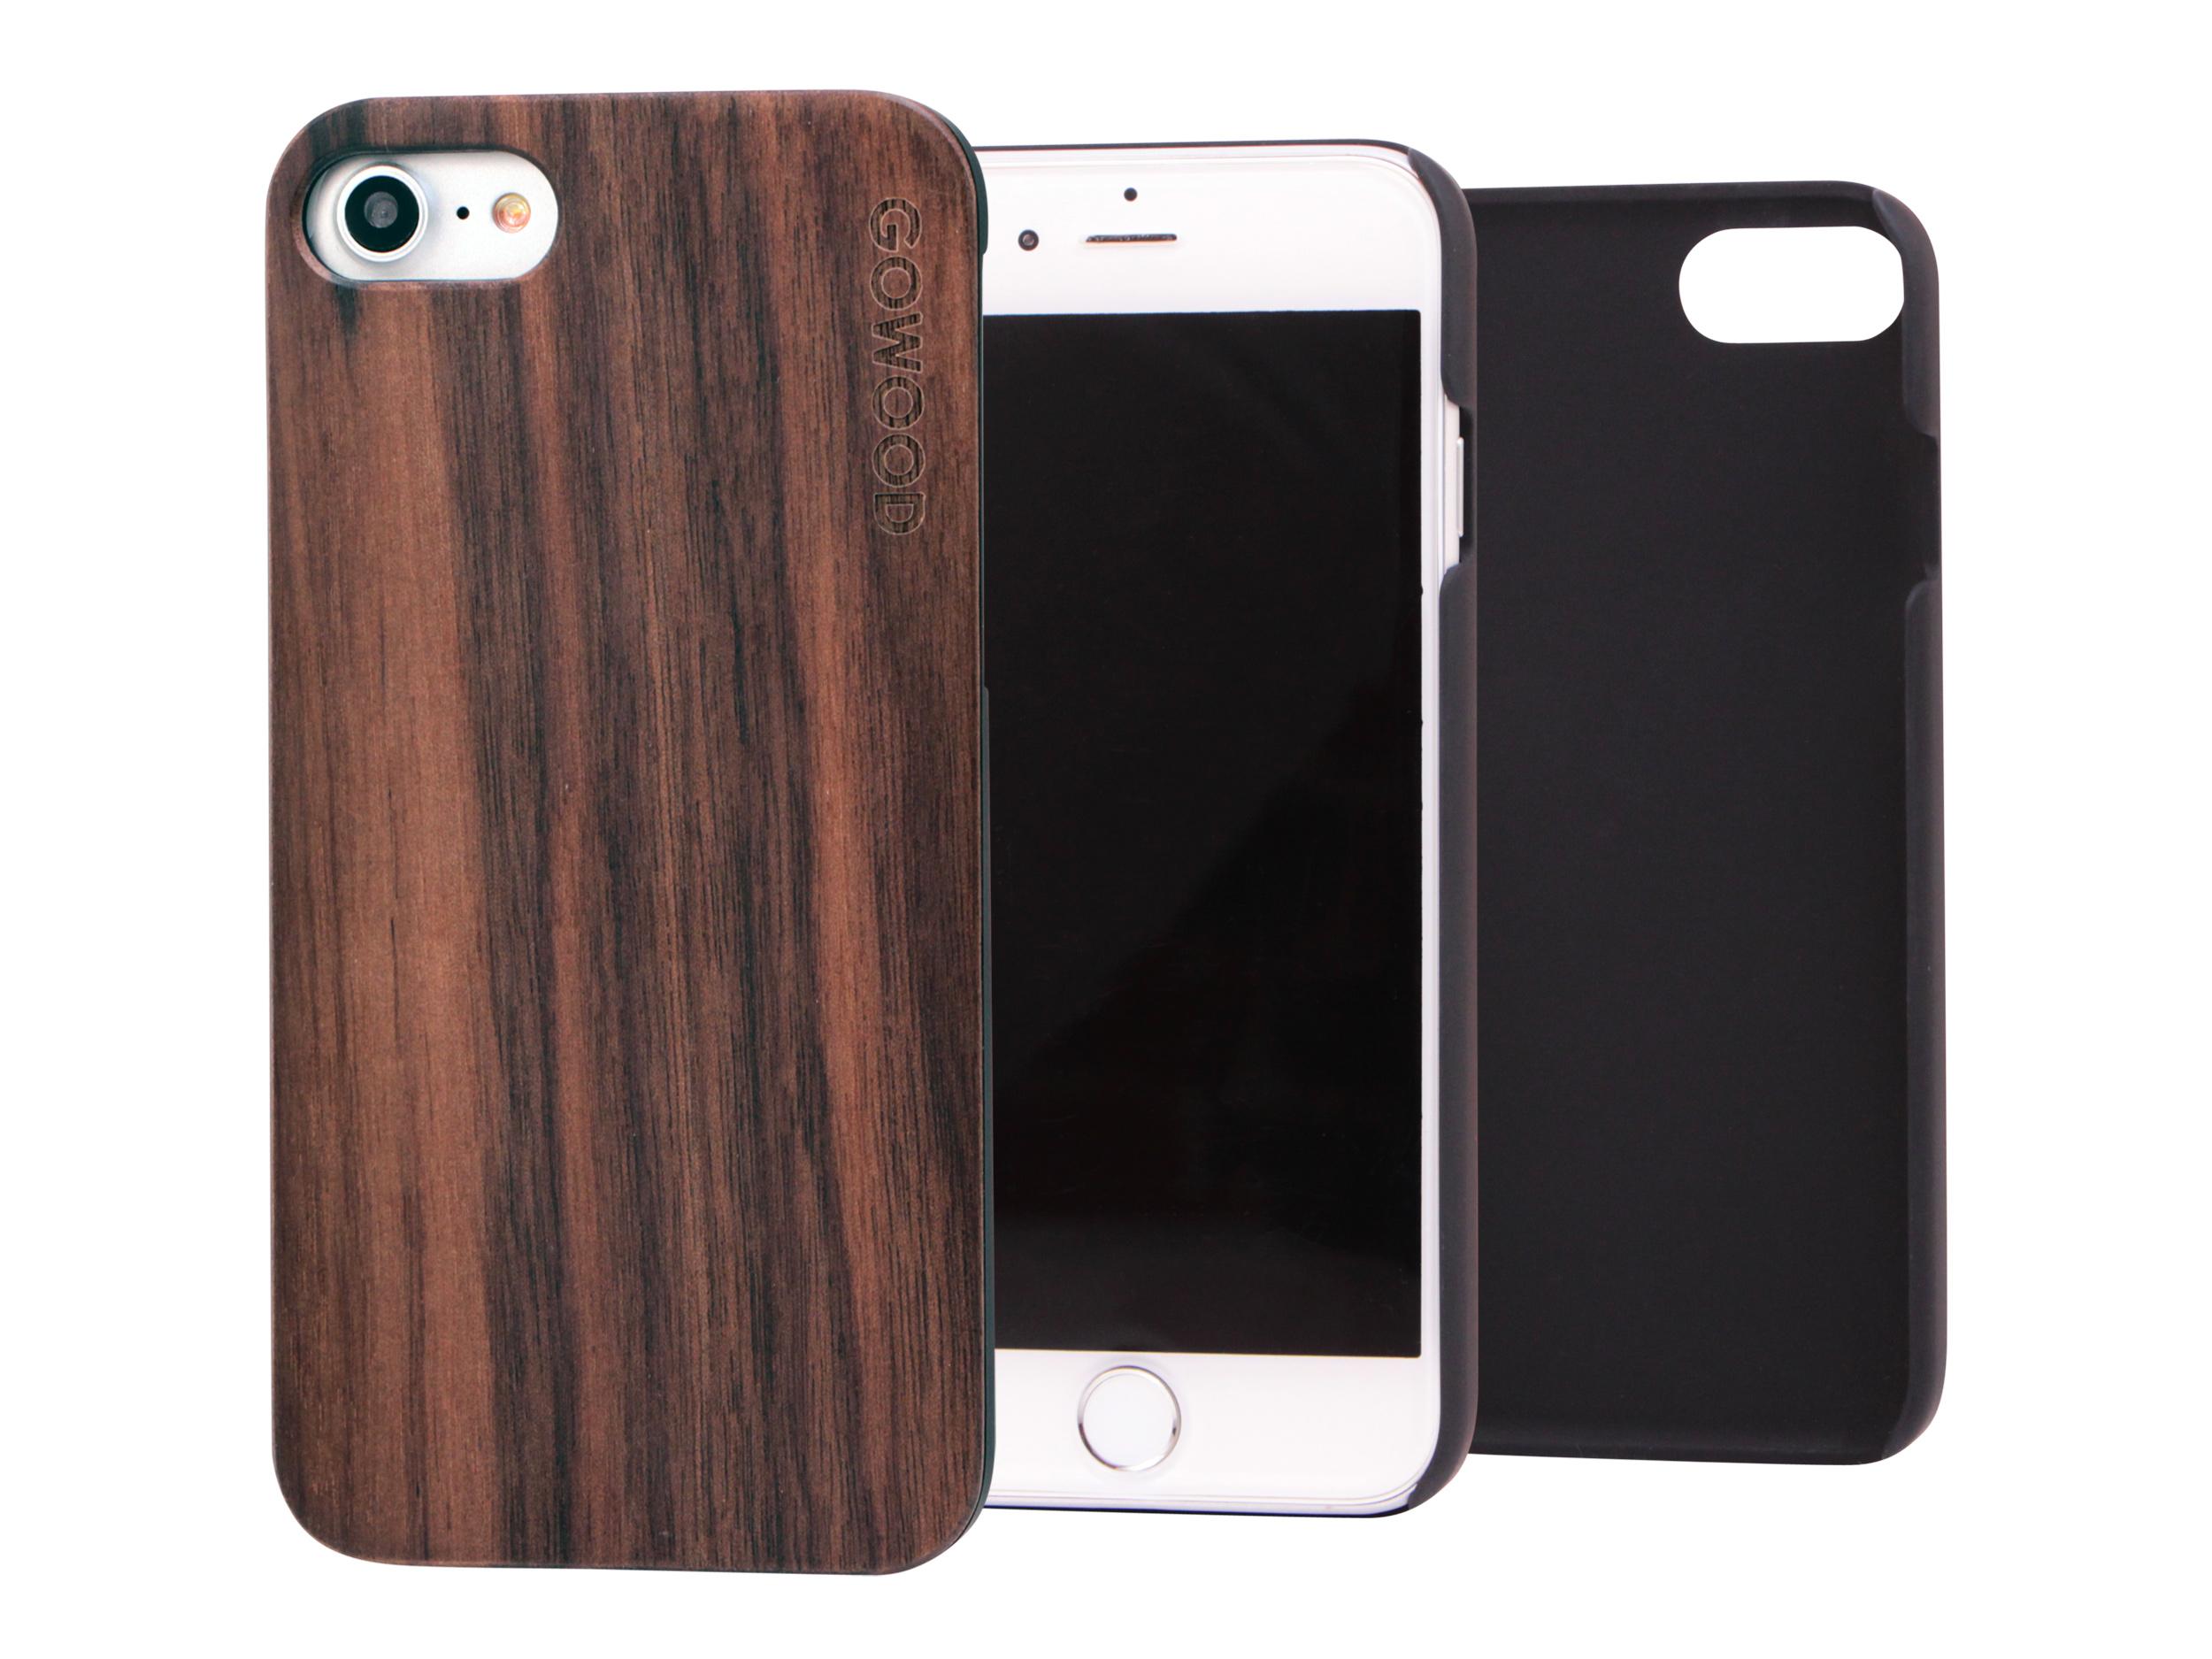 iPhone 7 hoesje walnoot hout